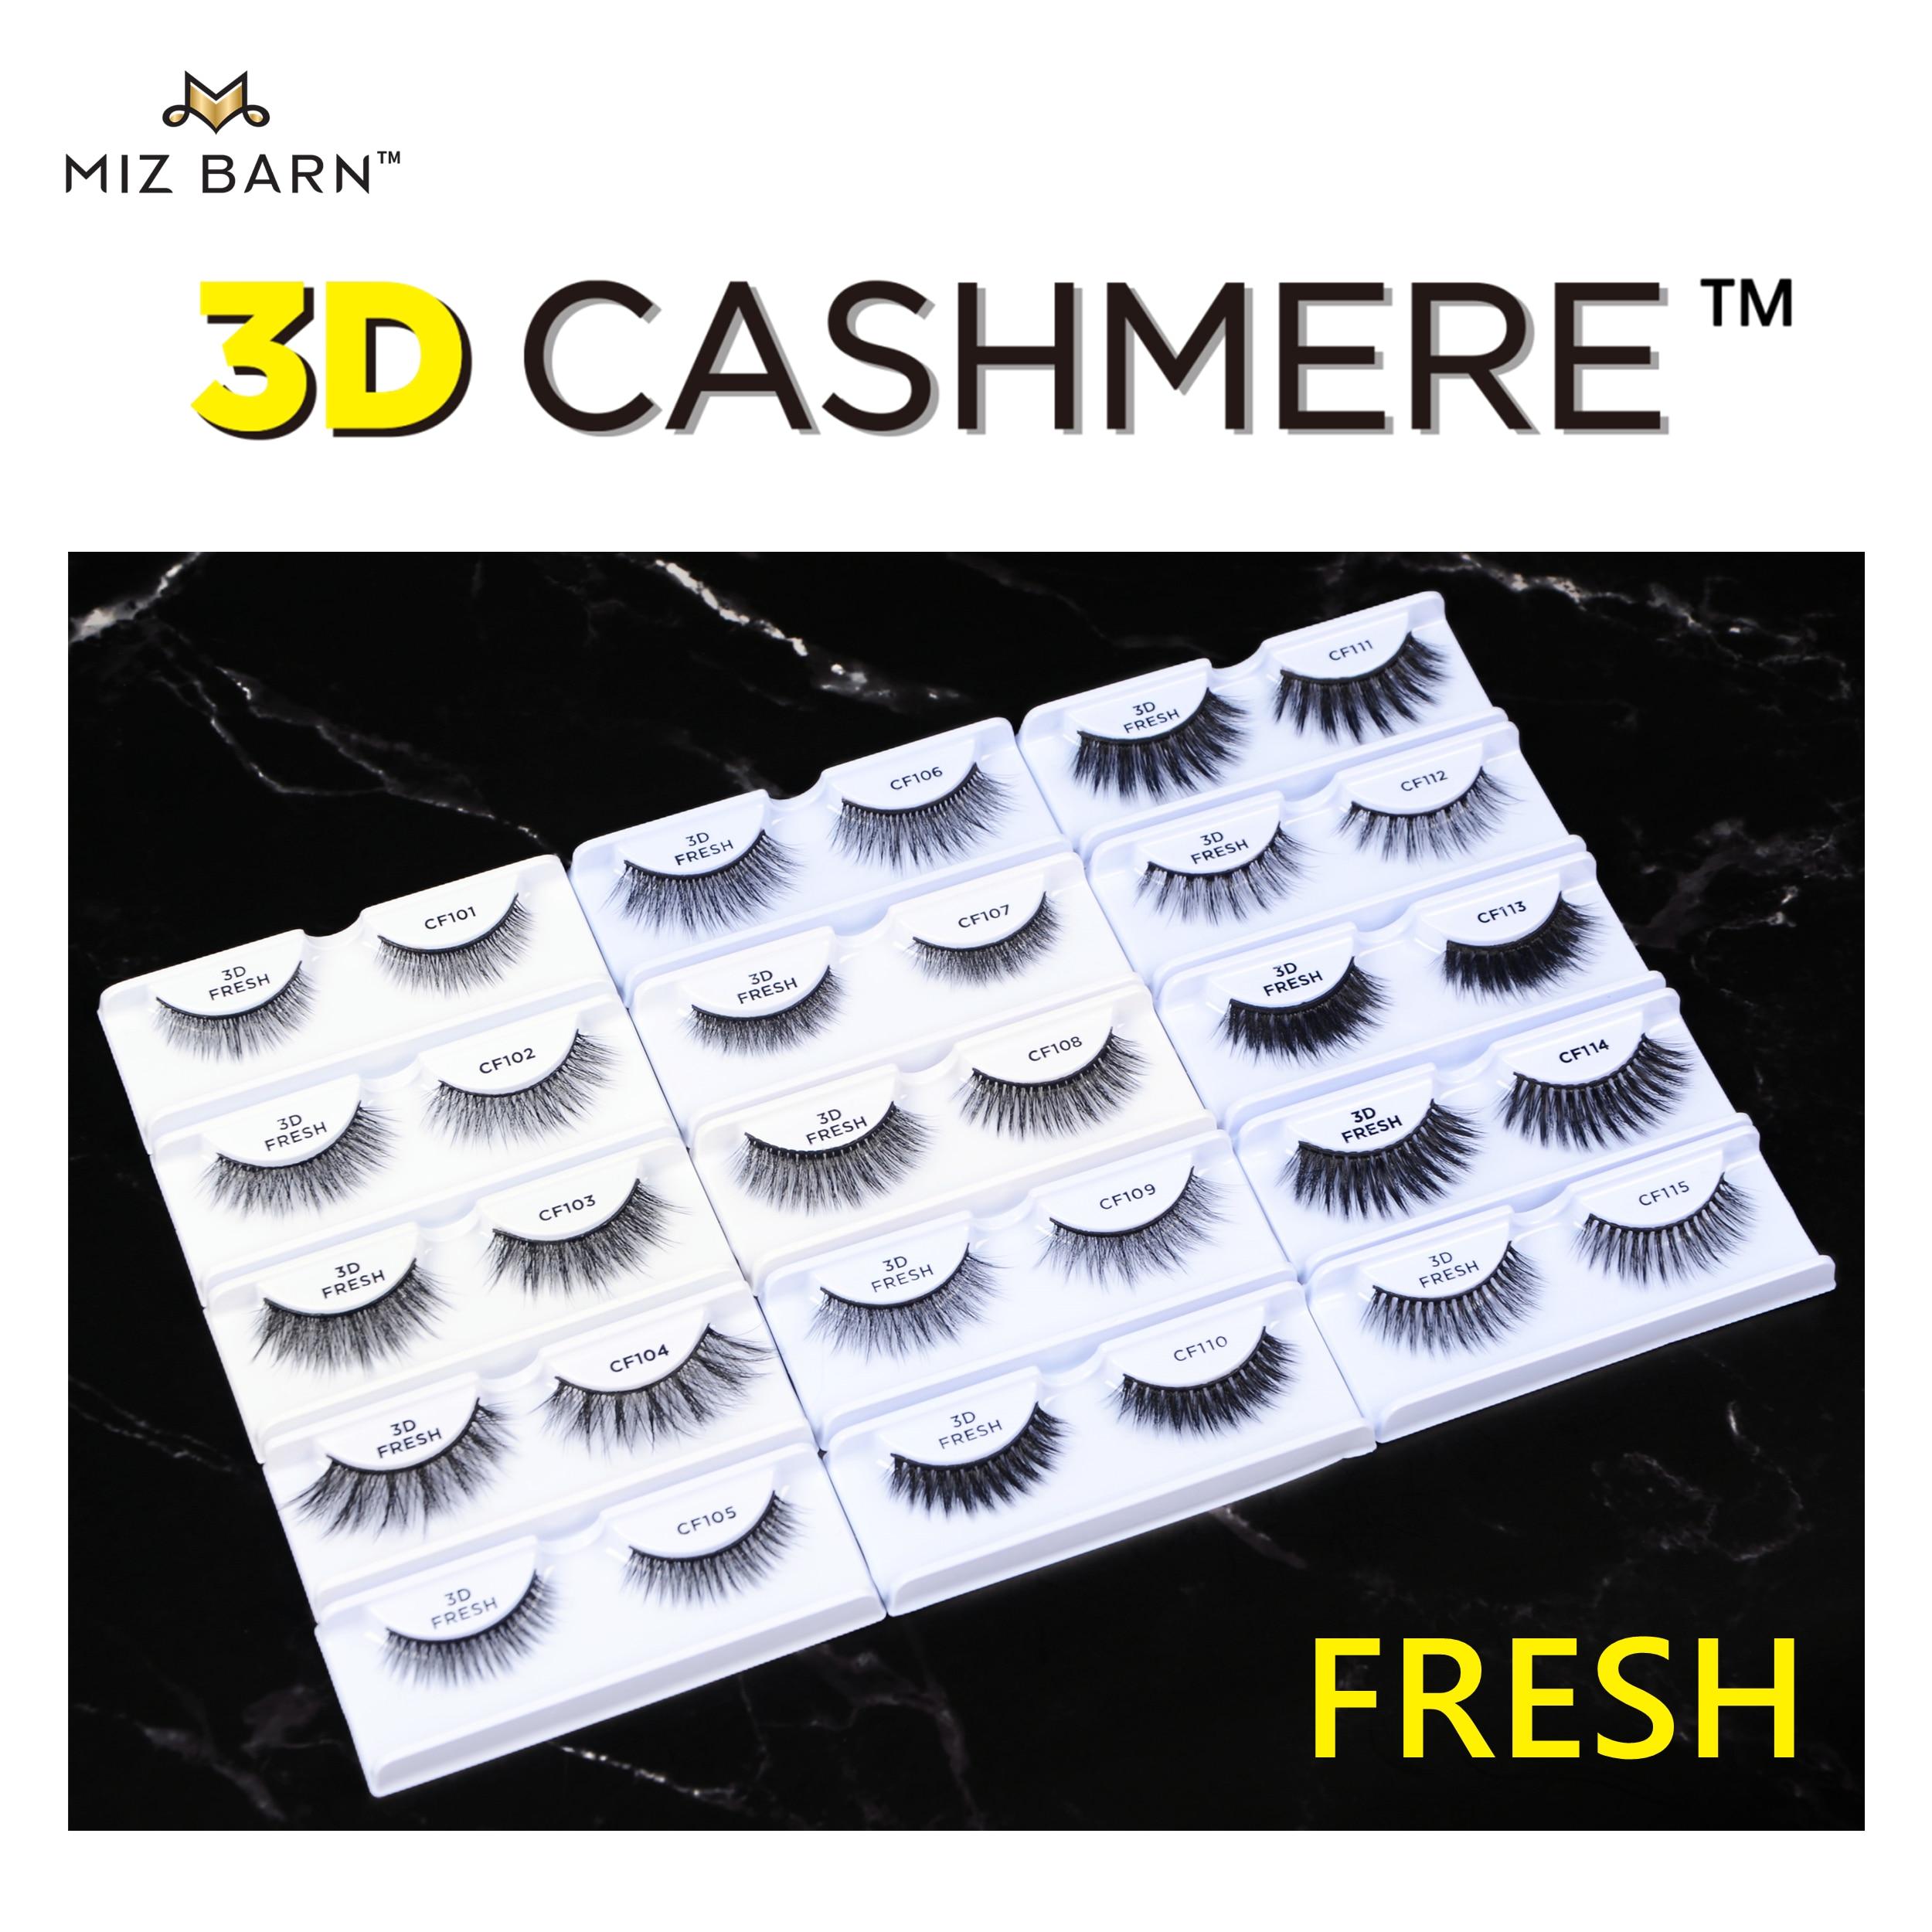 MIZ BARN 3D CASHMERE-FRESH Eyelashes Natural Soft Eye Makeup Lashes Volume Fluffy Handmade Faux Mink